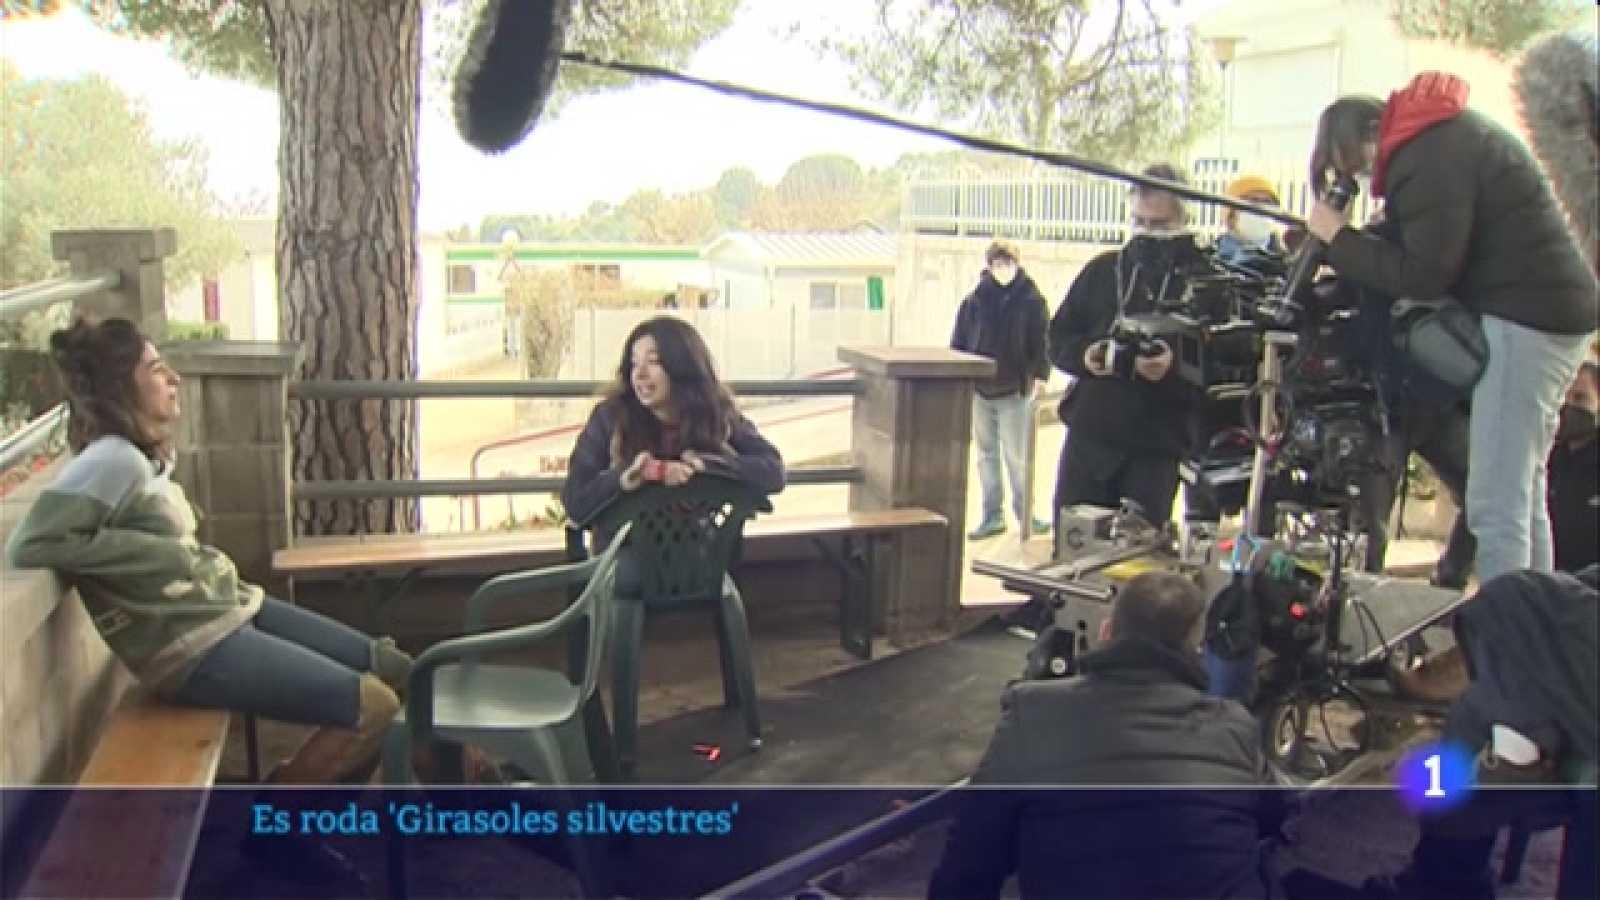 Jaime Rosales roda la seva nova pel·lícula 'Girasoles silvestres'